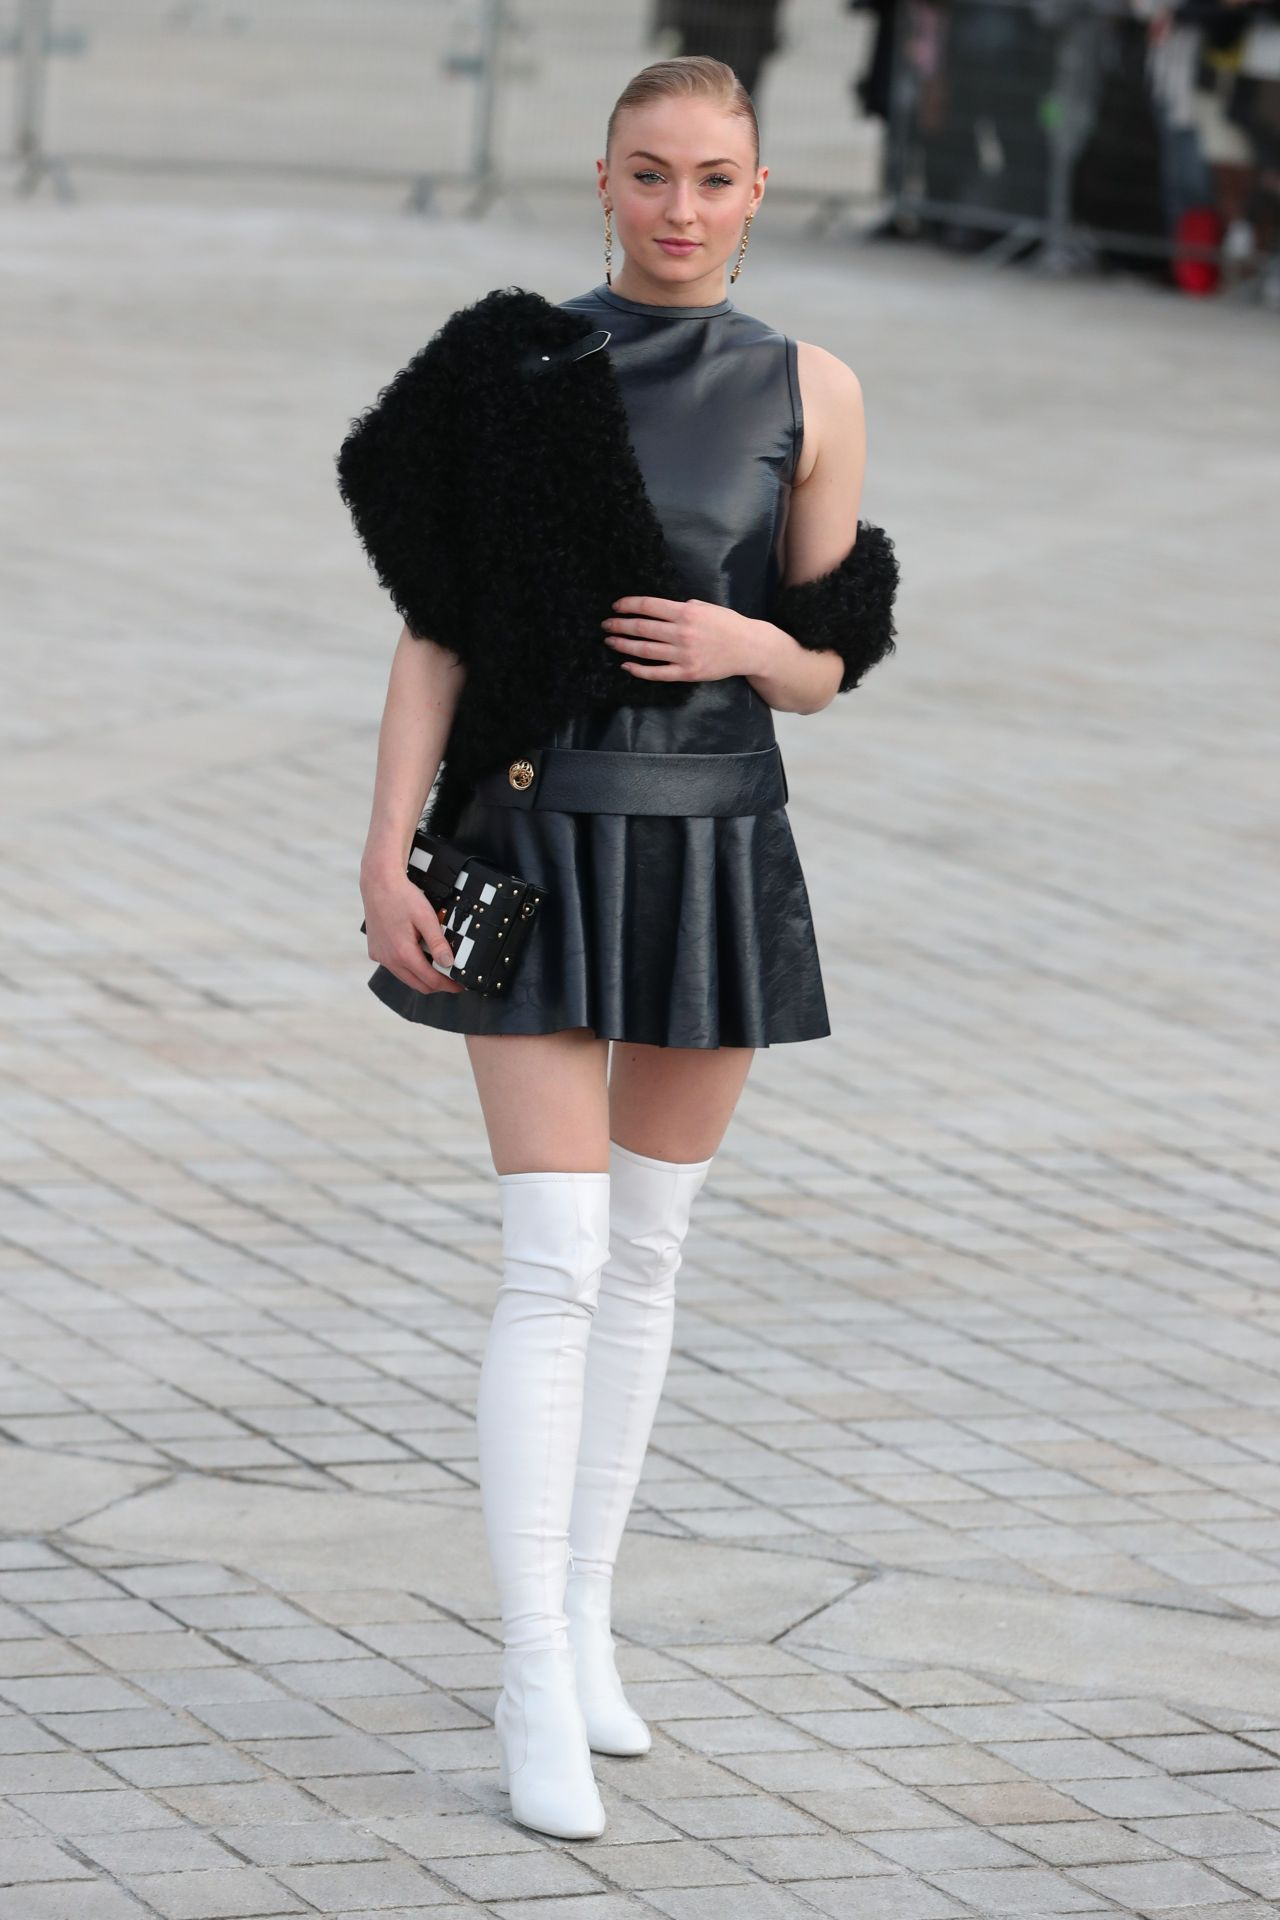 Sophie Turner Attends Louis Vuitton Show Paris Fashion Week 3 7 2017